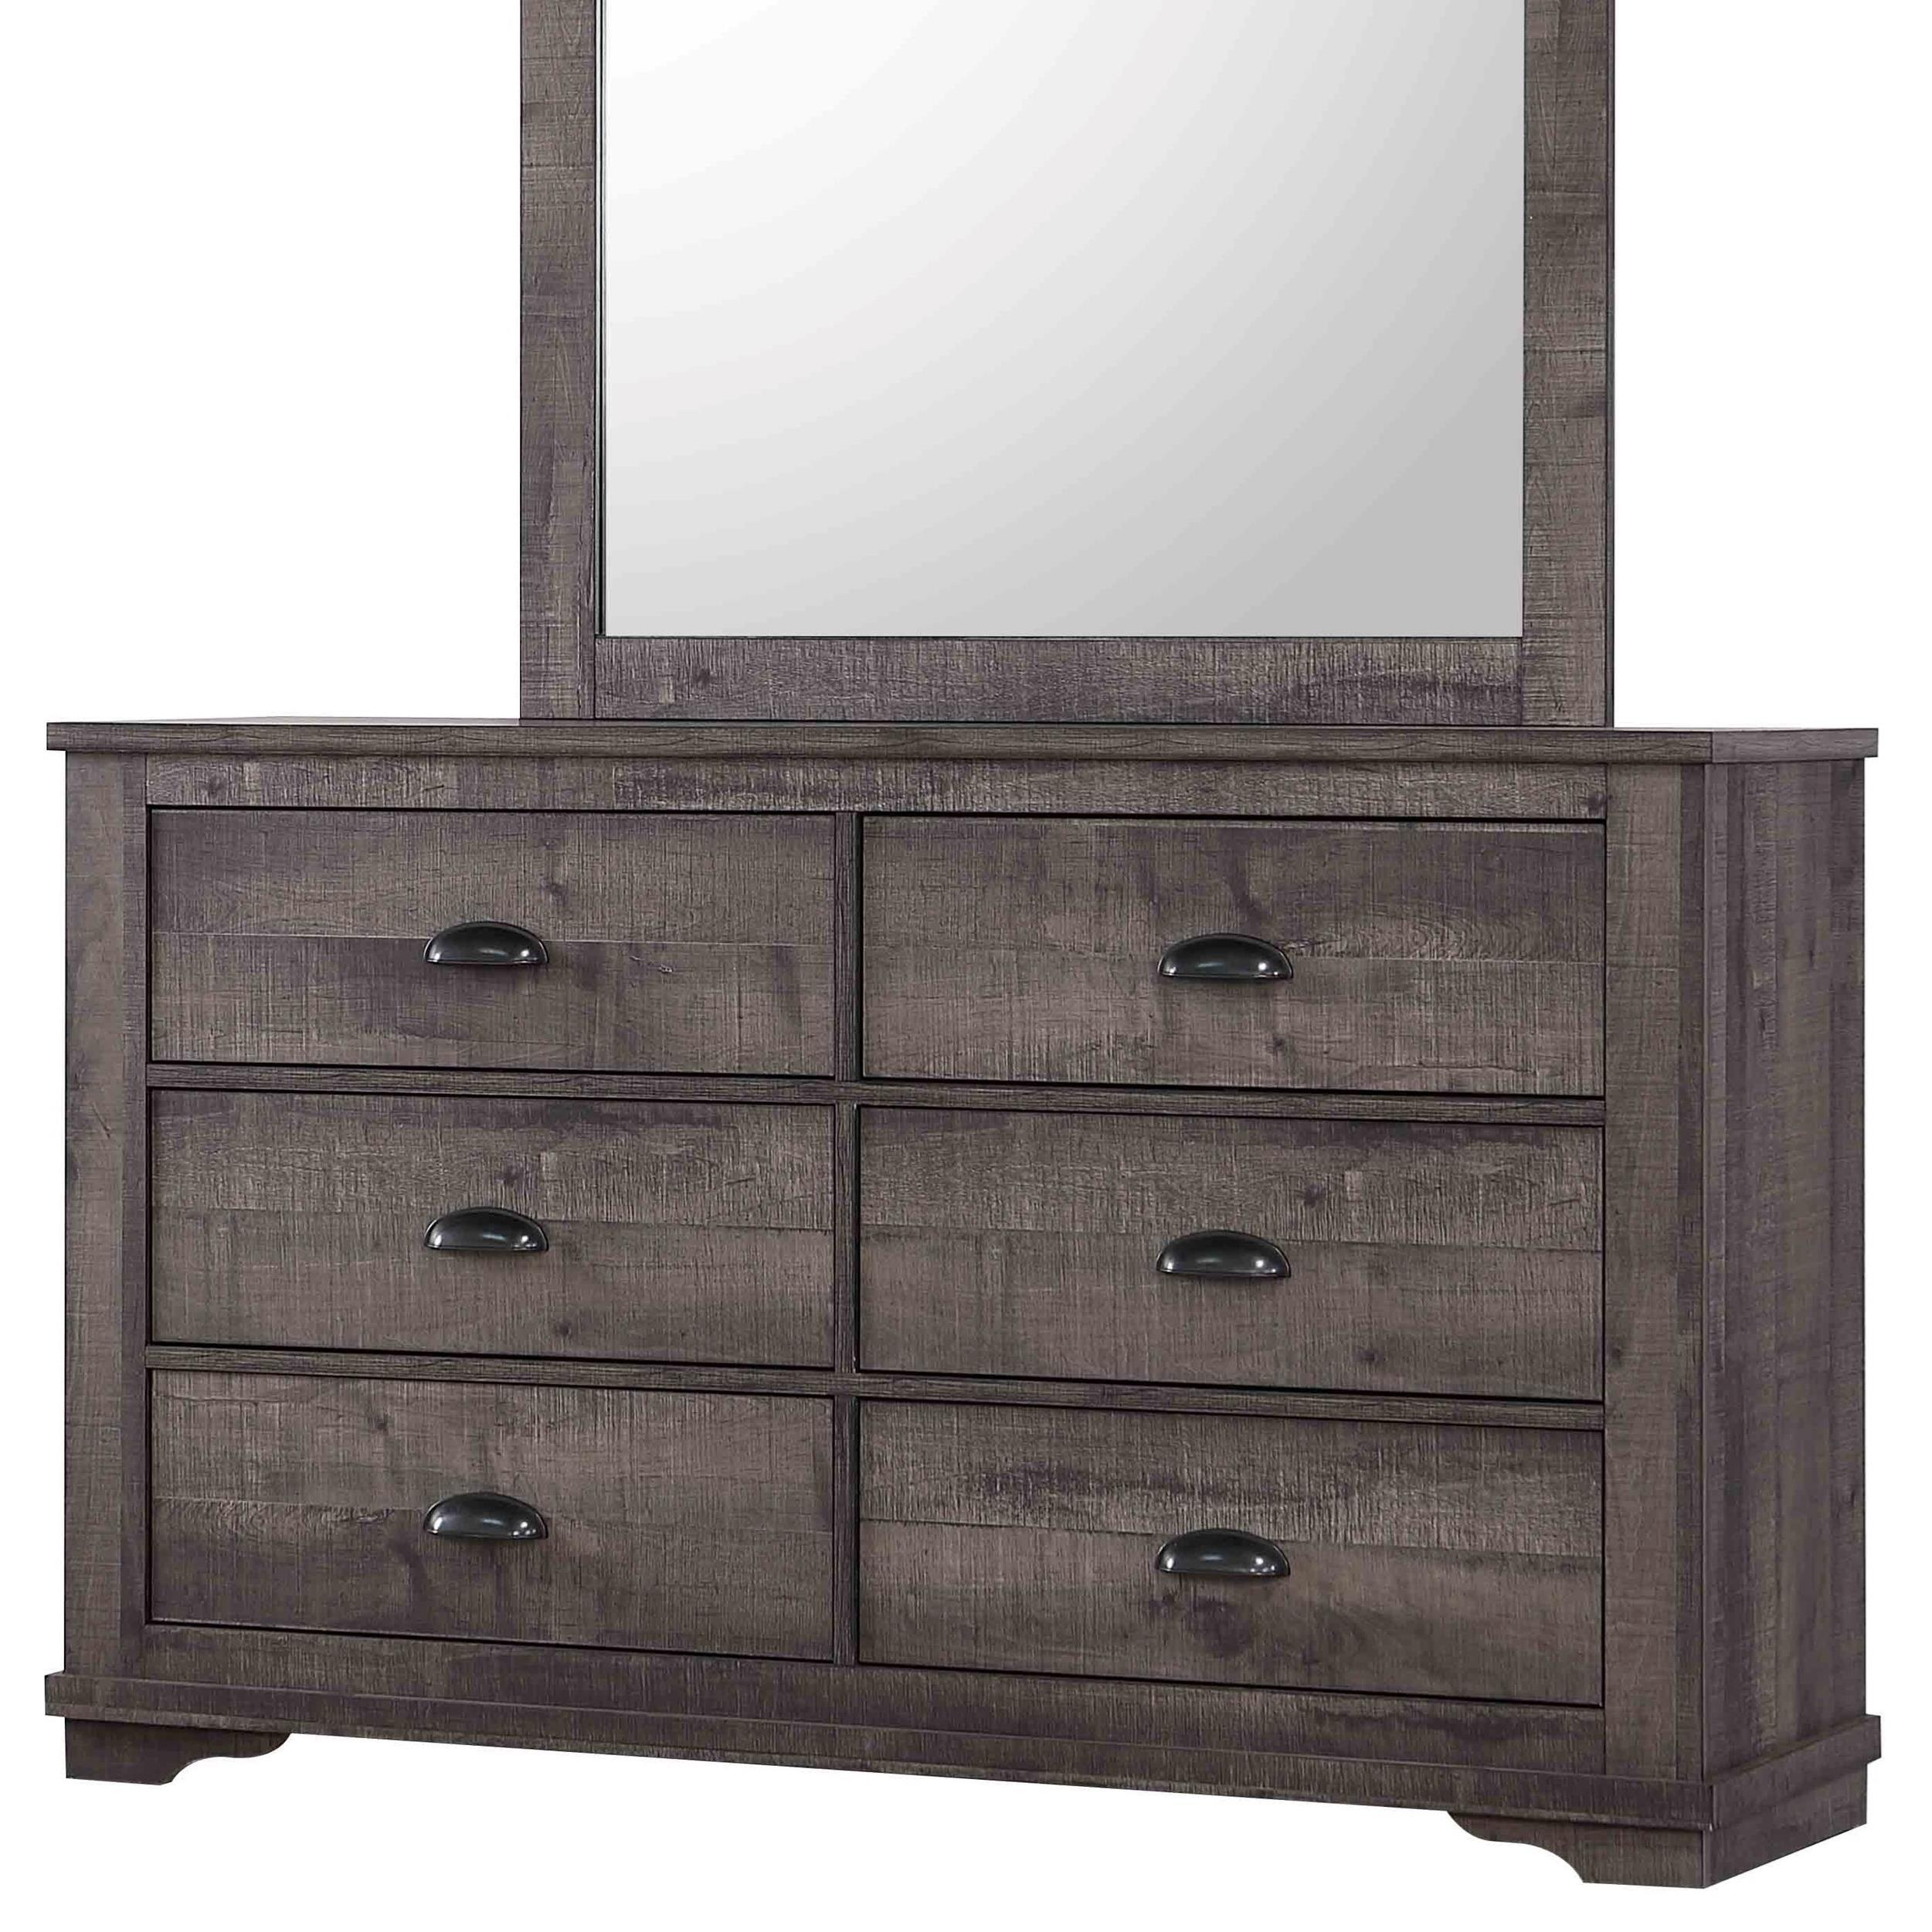 Coralee Dresser by Crown Mark at Darvin Furniture